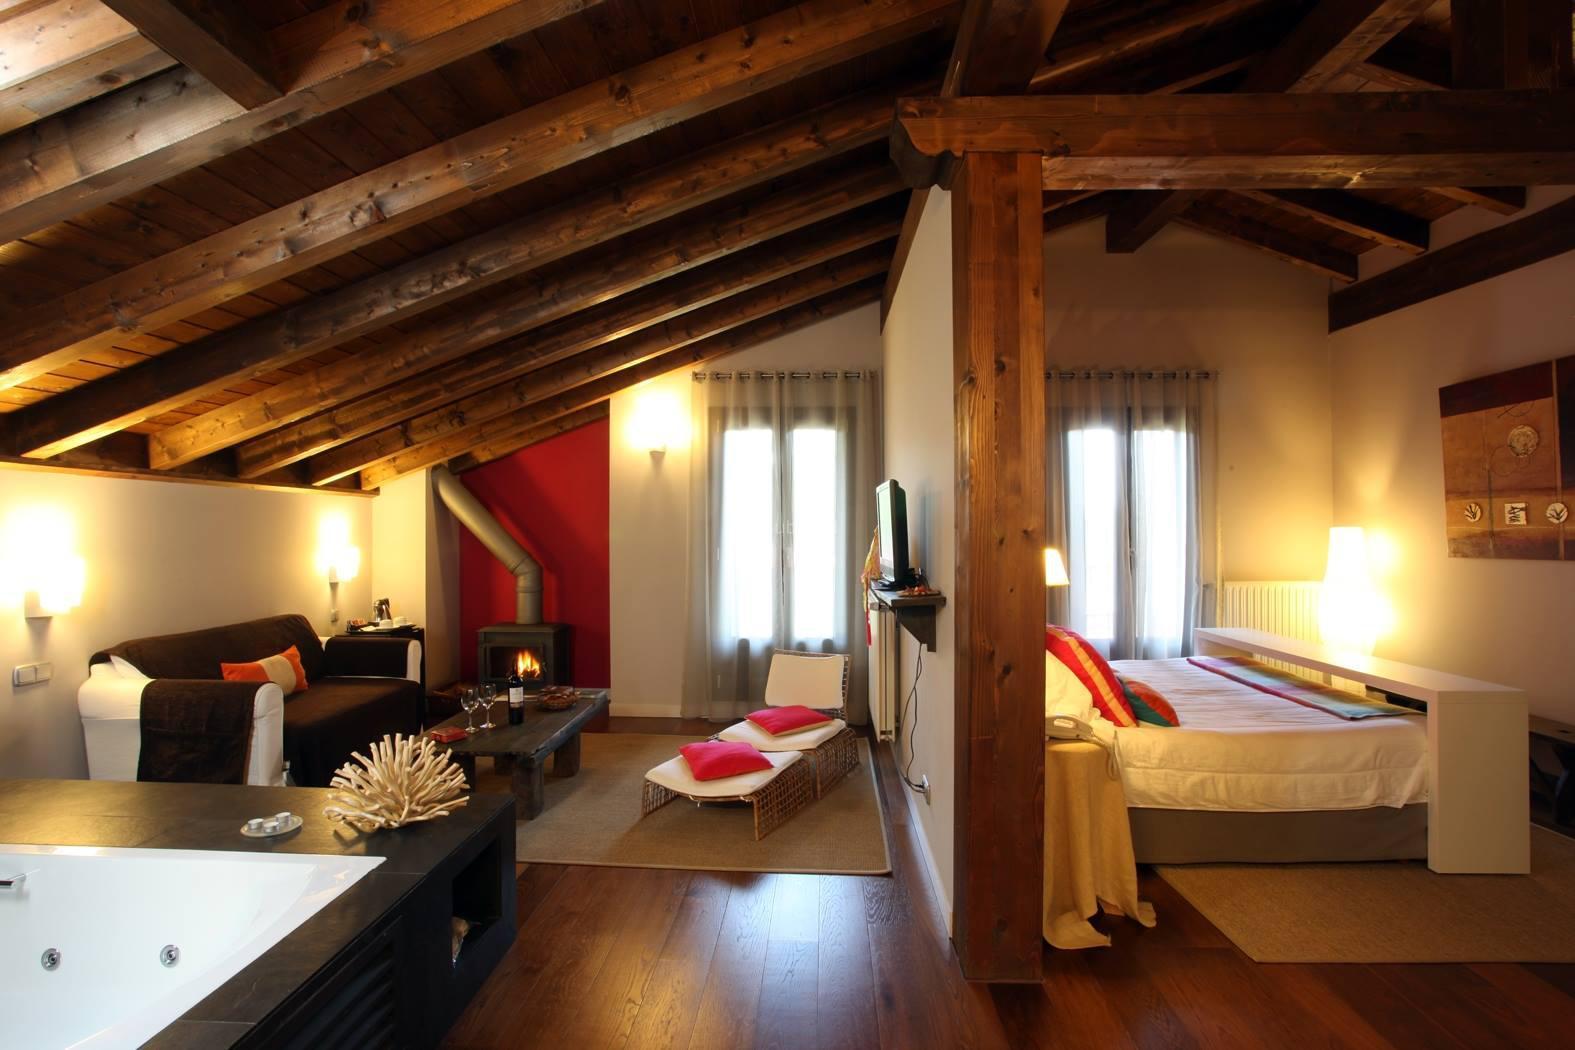 Fotos de Hotel Iribarnia   Navarra  Lantz  Clubrural